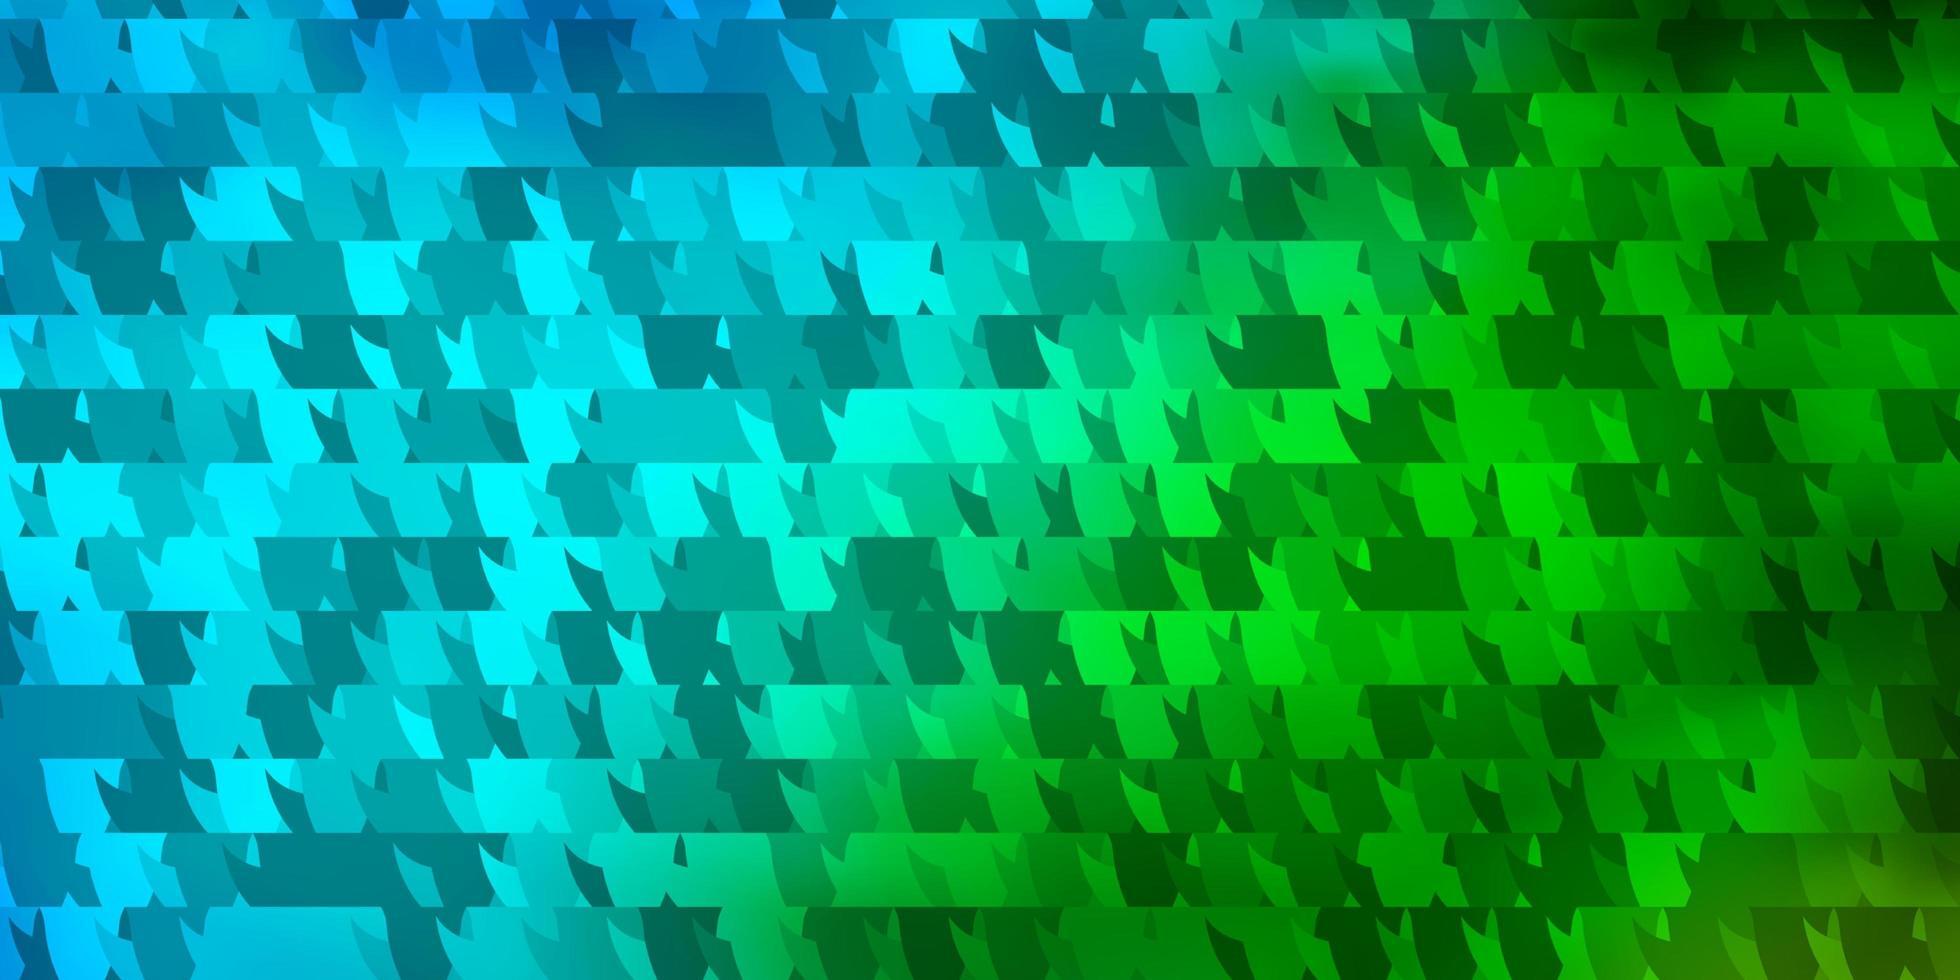 fond de vecteur bleu clair, vert avec un style polygonal.